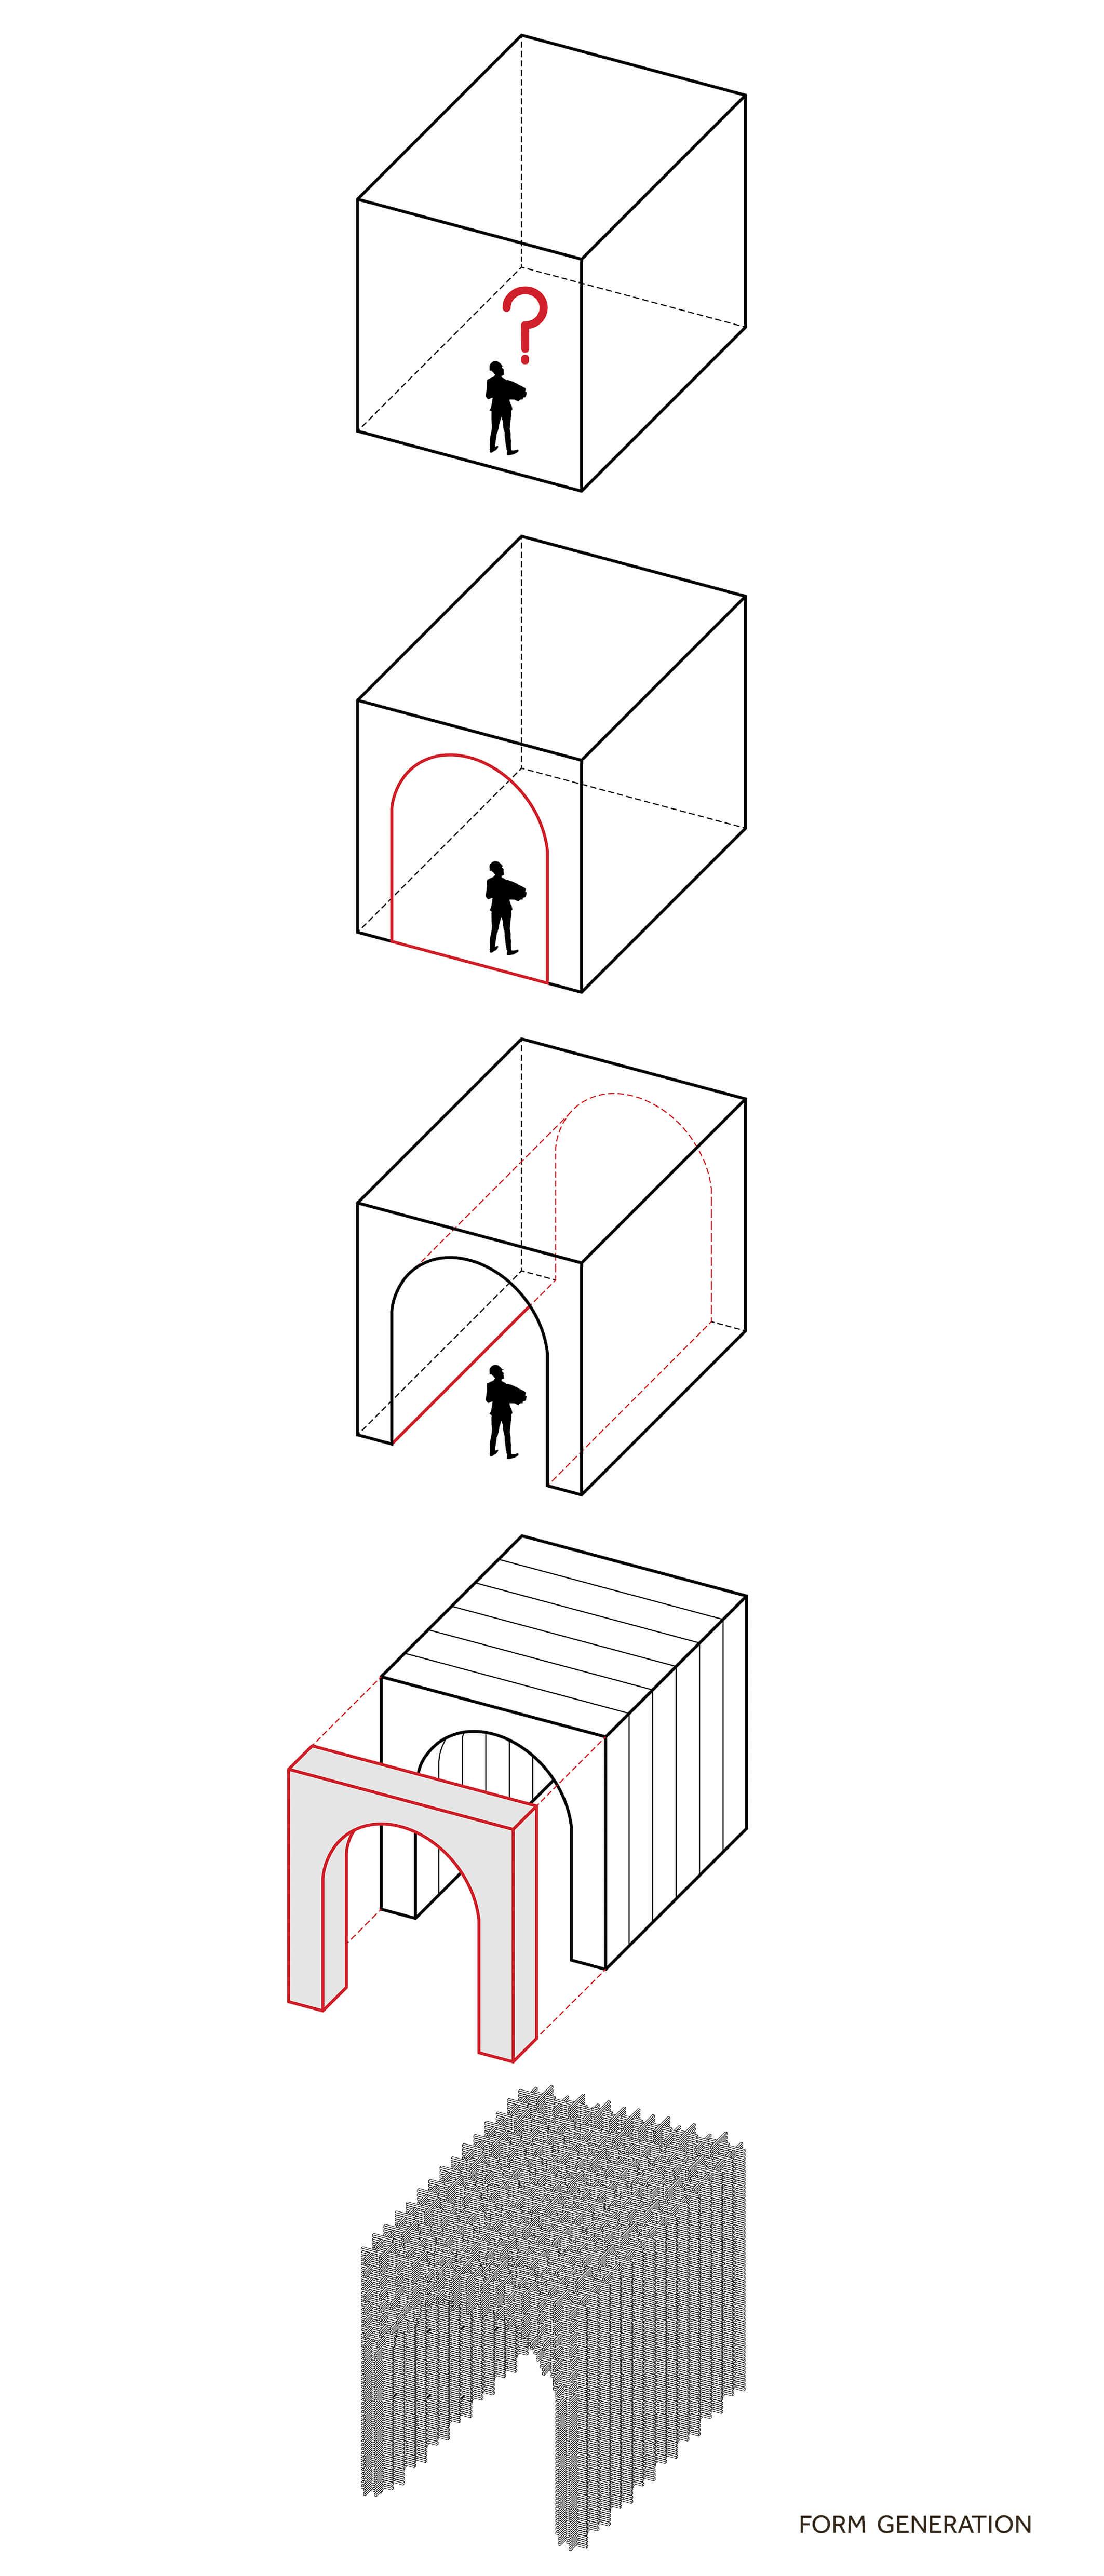 Unit+ Recycled Pavillion Kuwait City 2019 Diagram by Studio Toggle